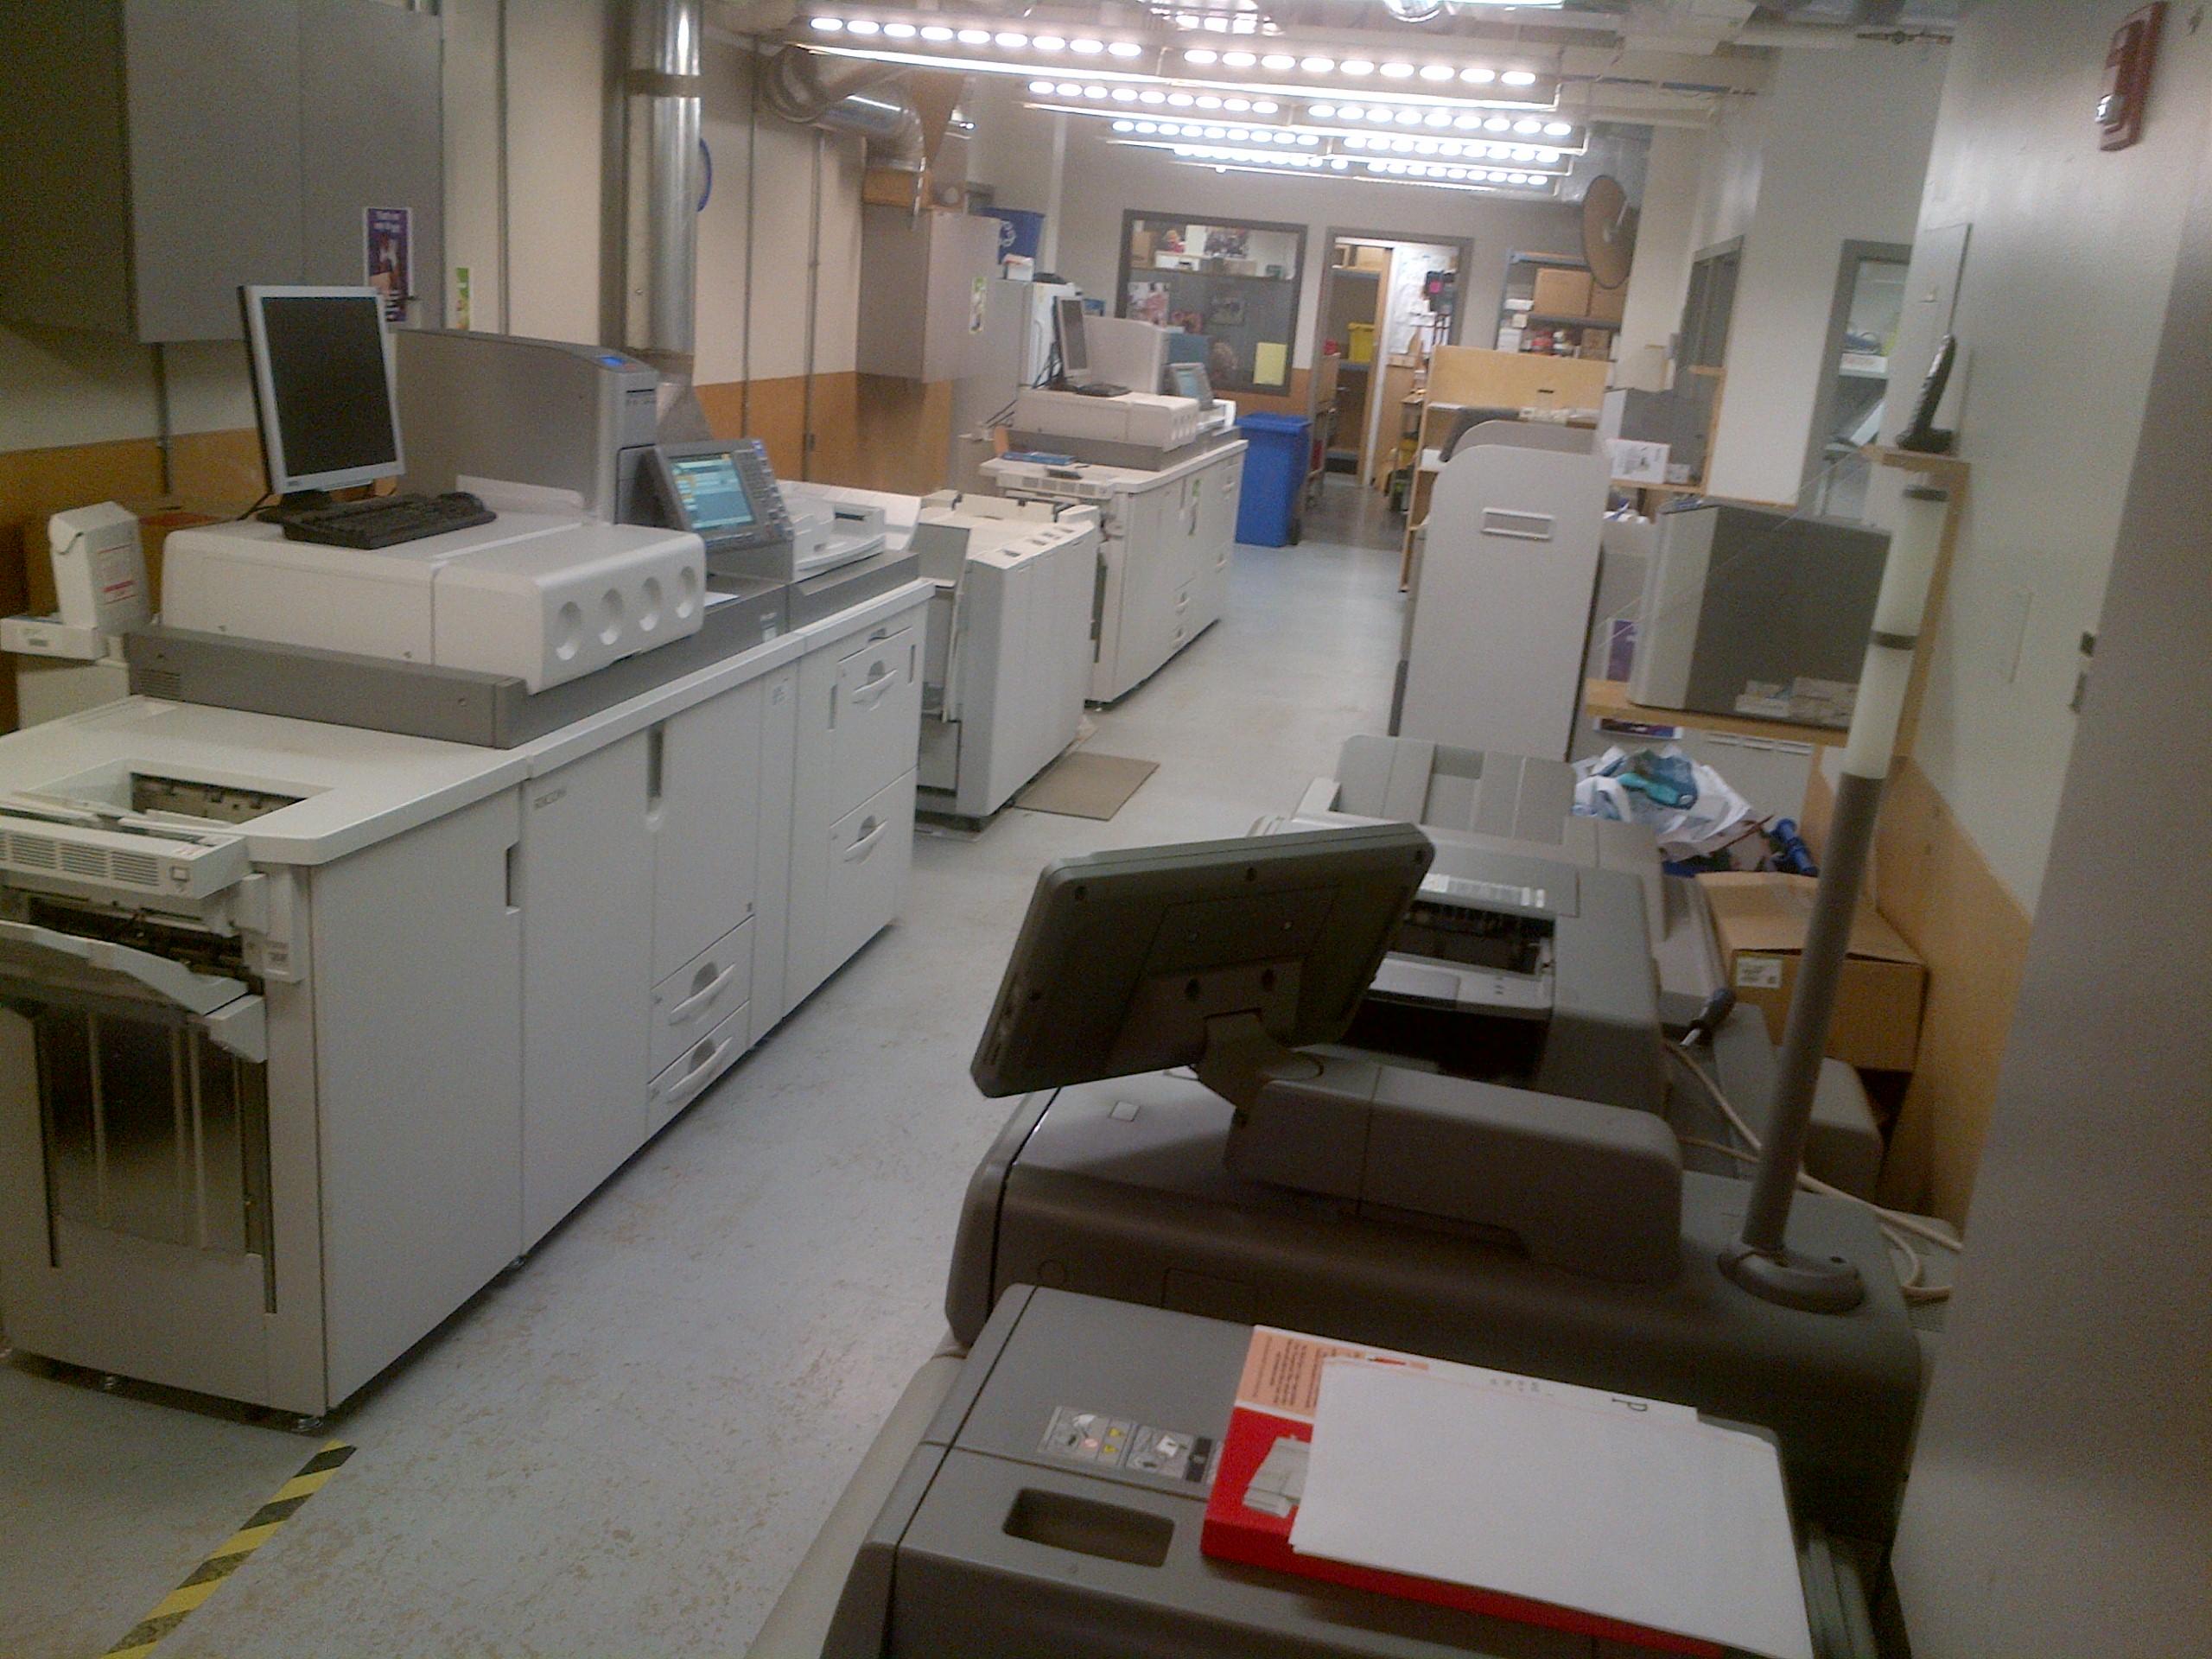 KPU Print Shop